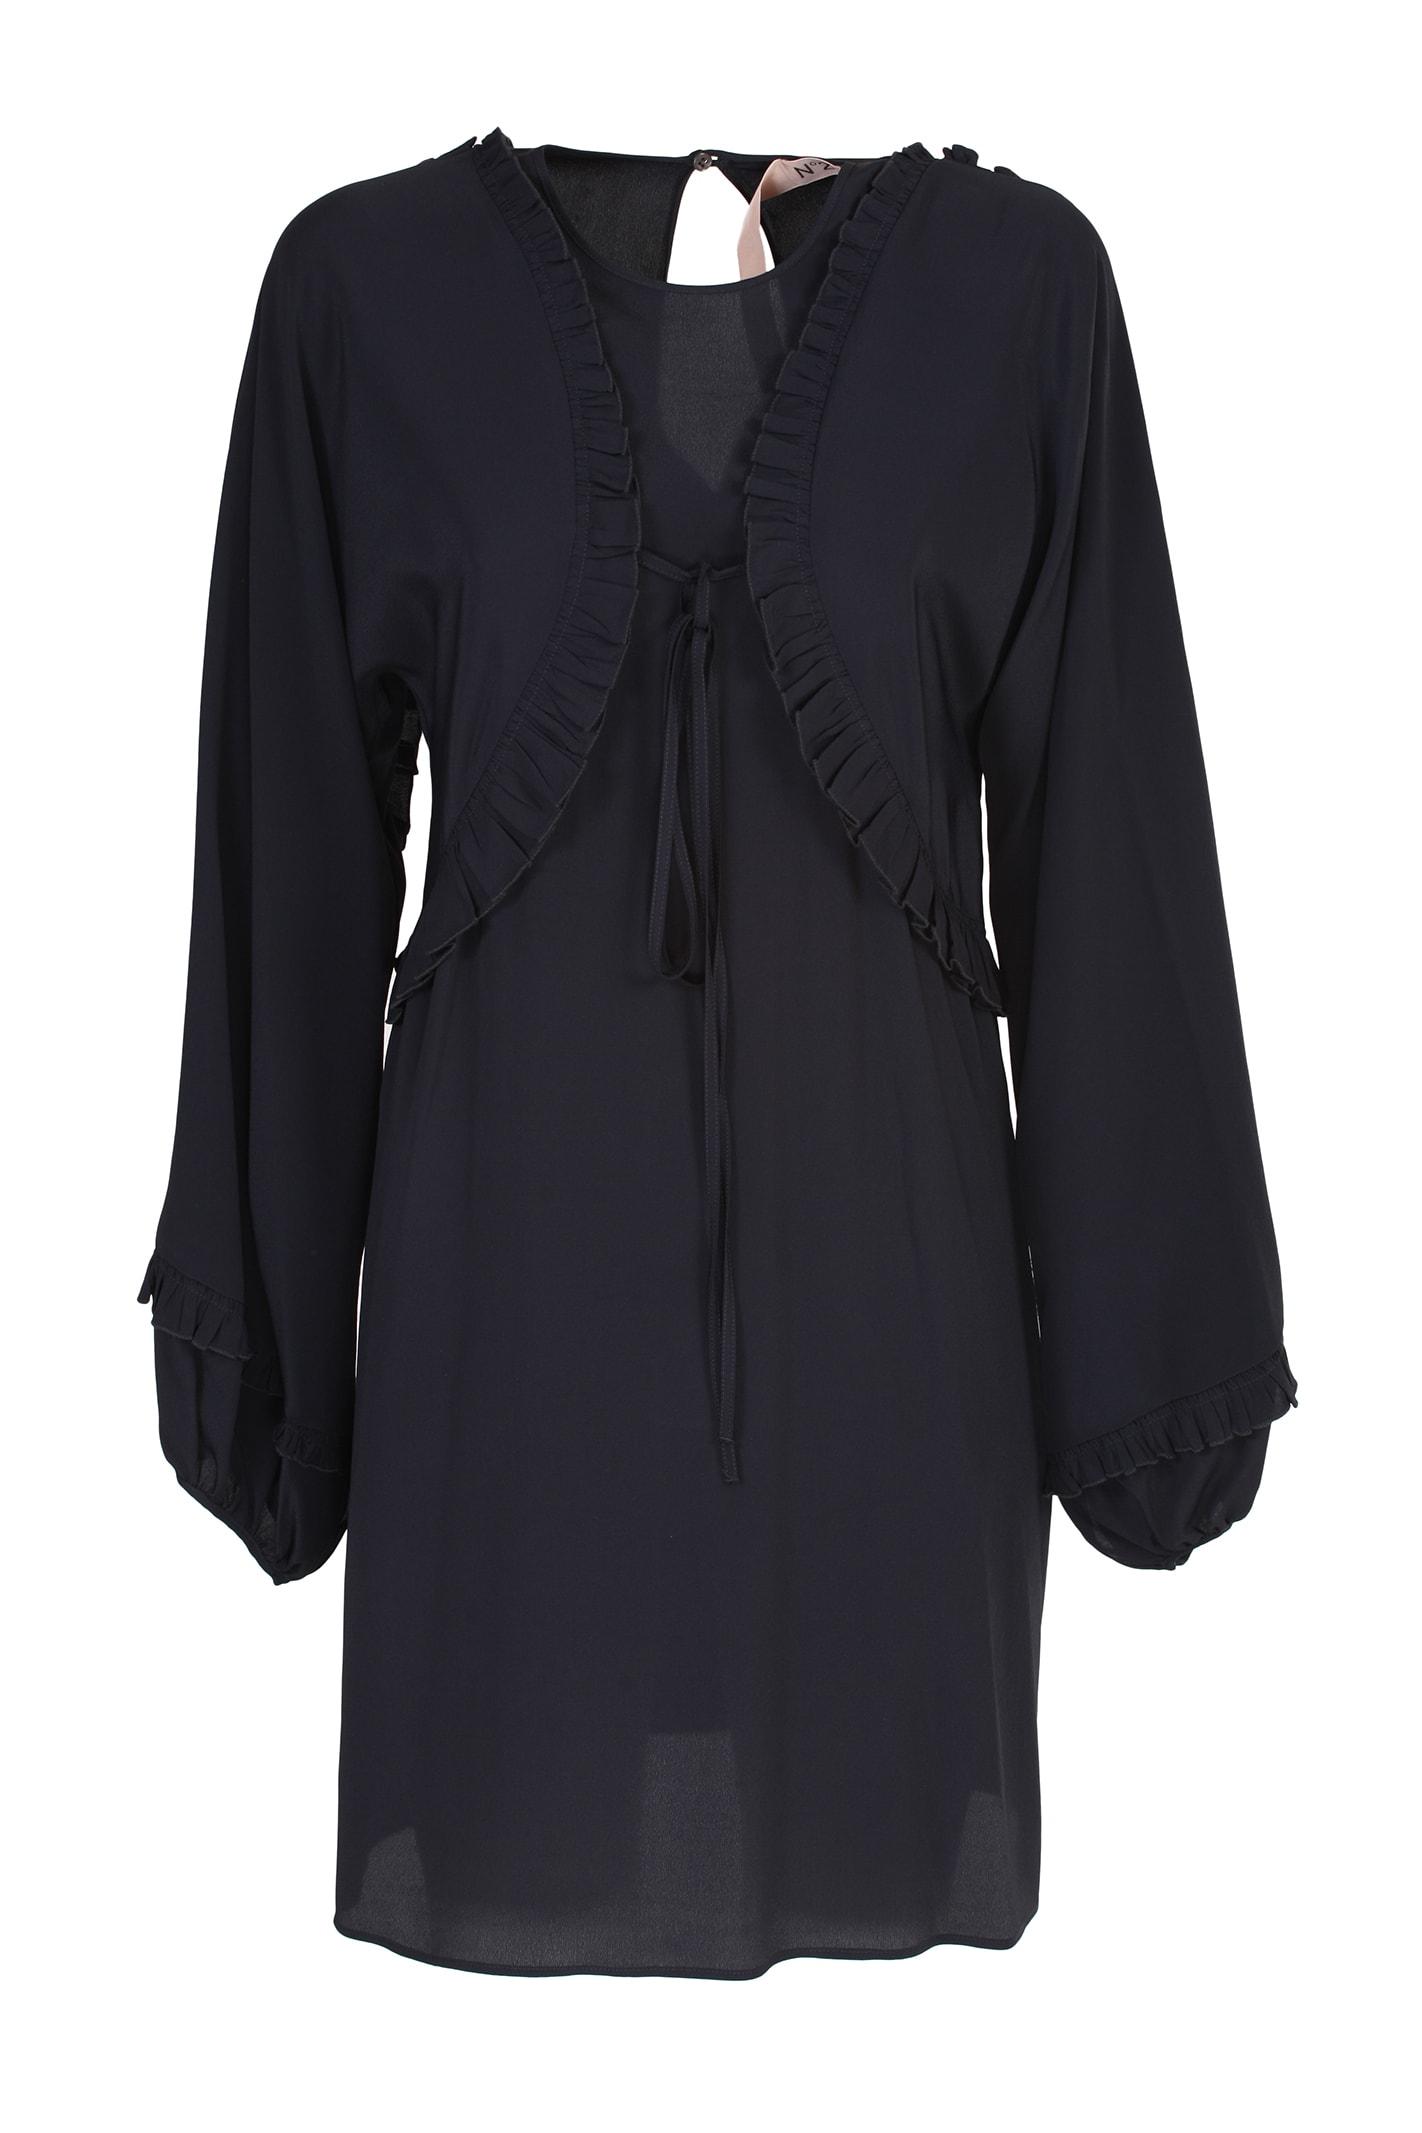 Buy N. 21 black silk dress online, shop N.21 with free shipping